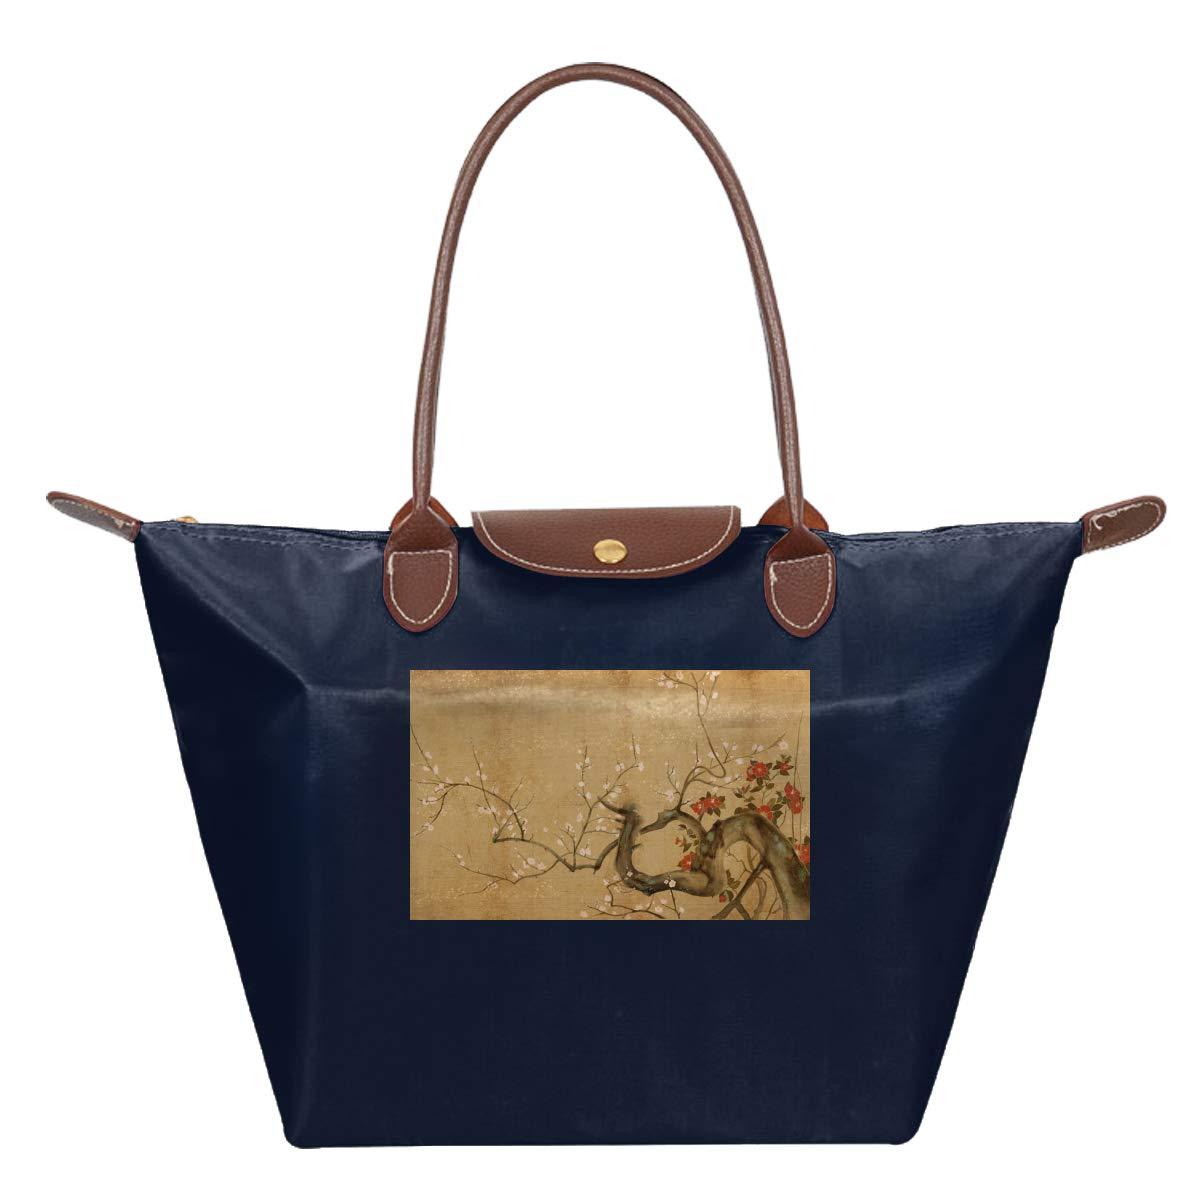 Japanese Flowers Art Waterproof Leather Folded Messenger Nylon Bag Travel Tote Hopping Folding School Handbags